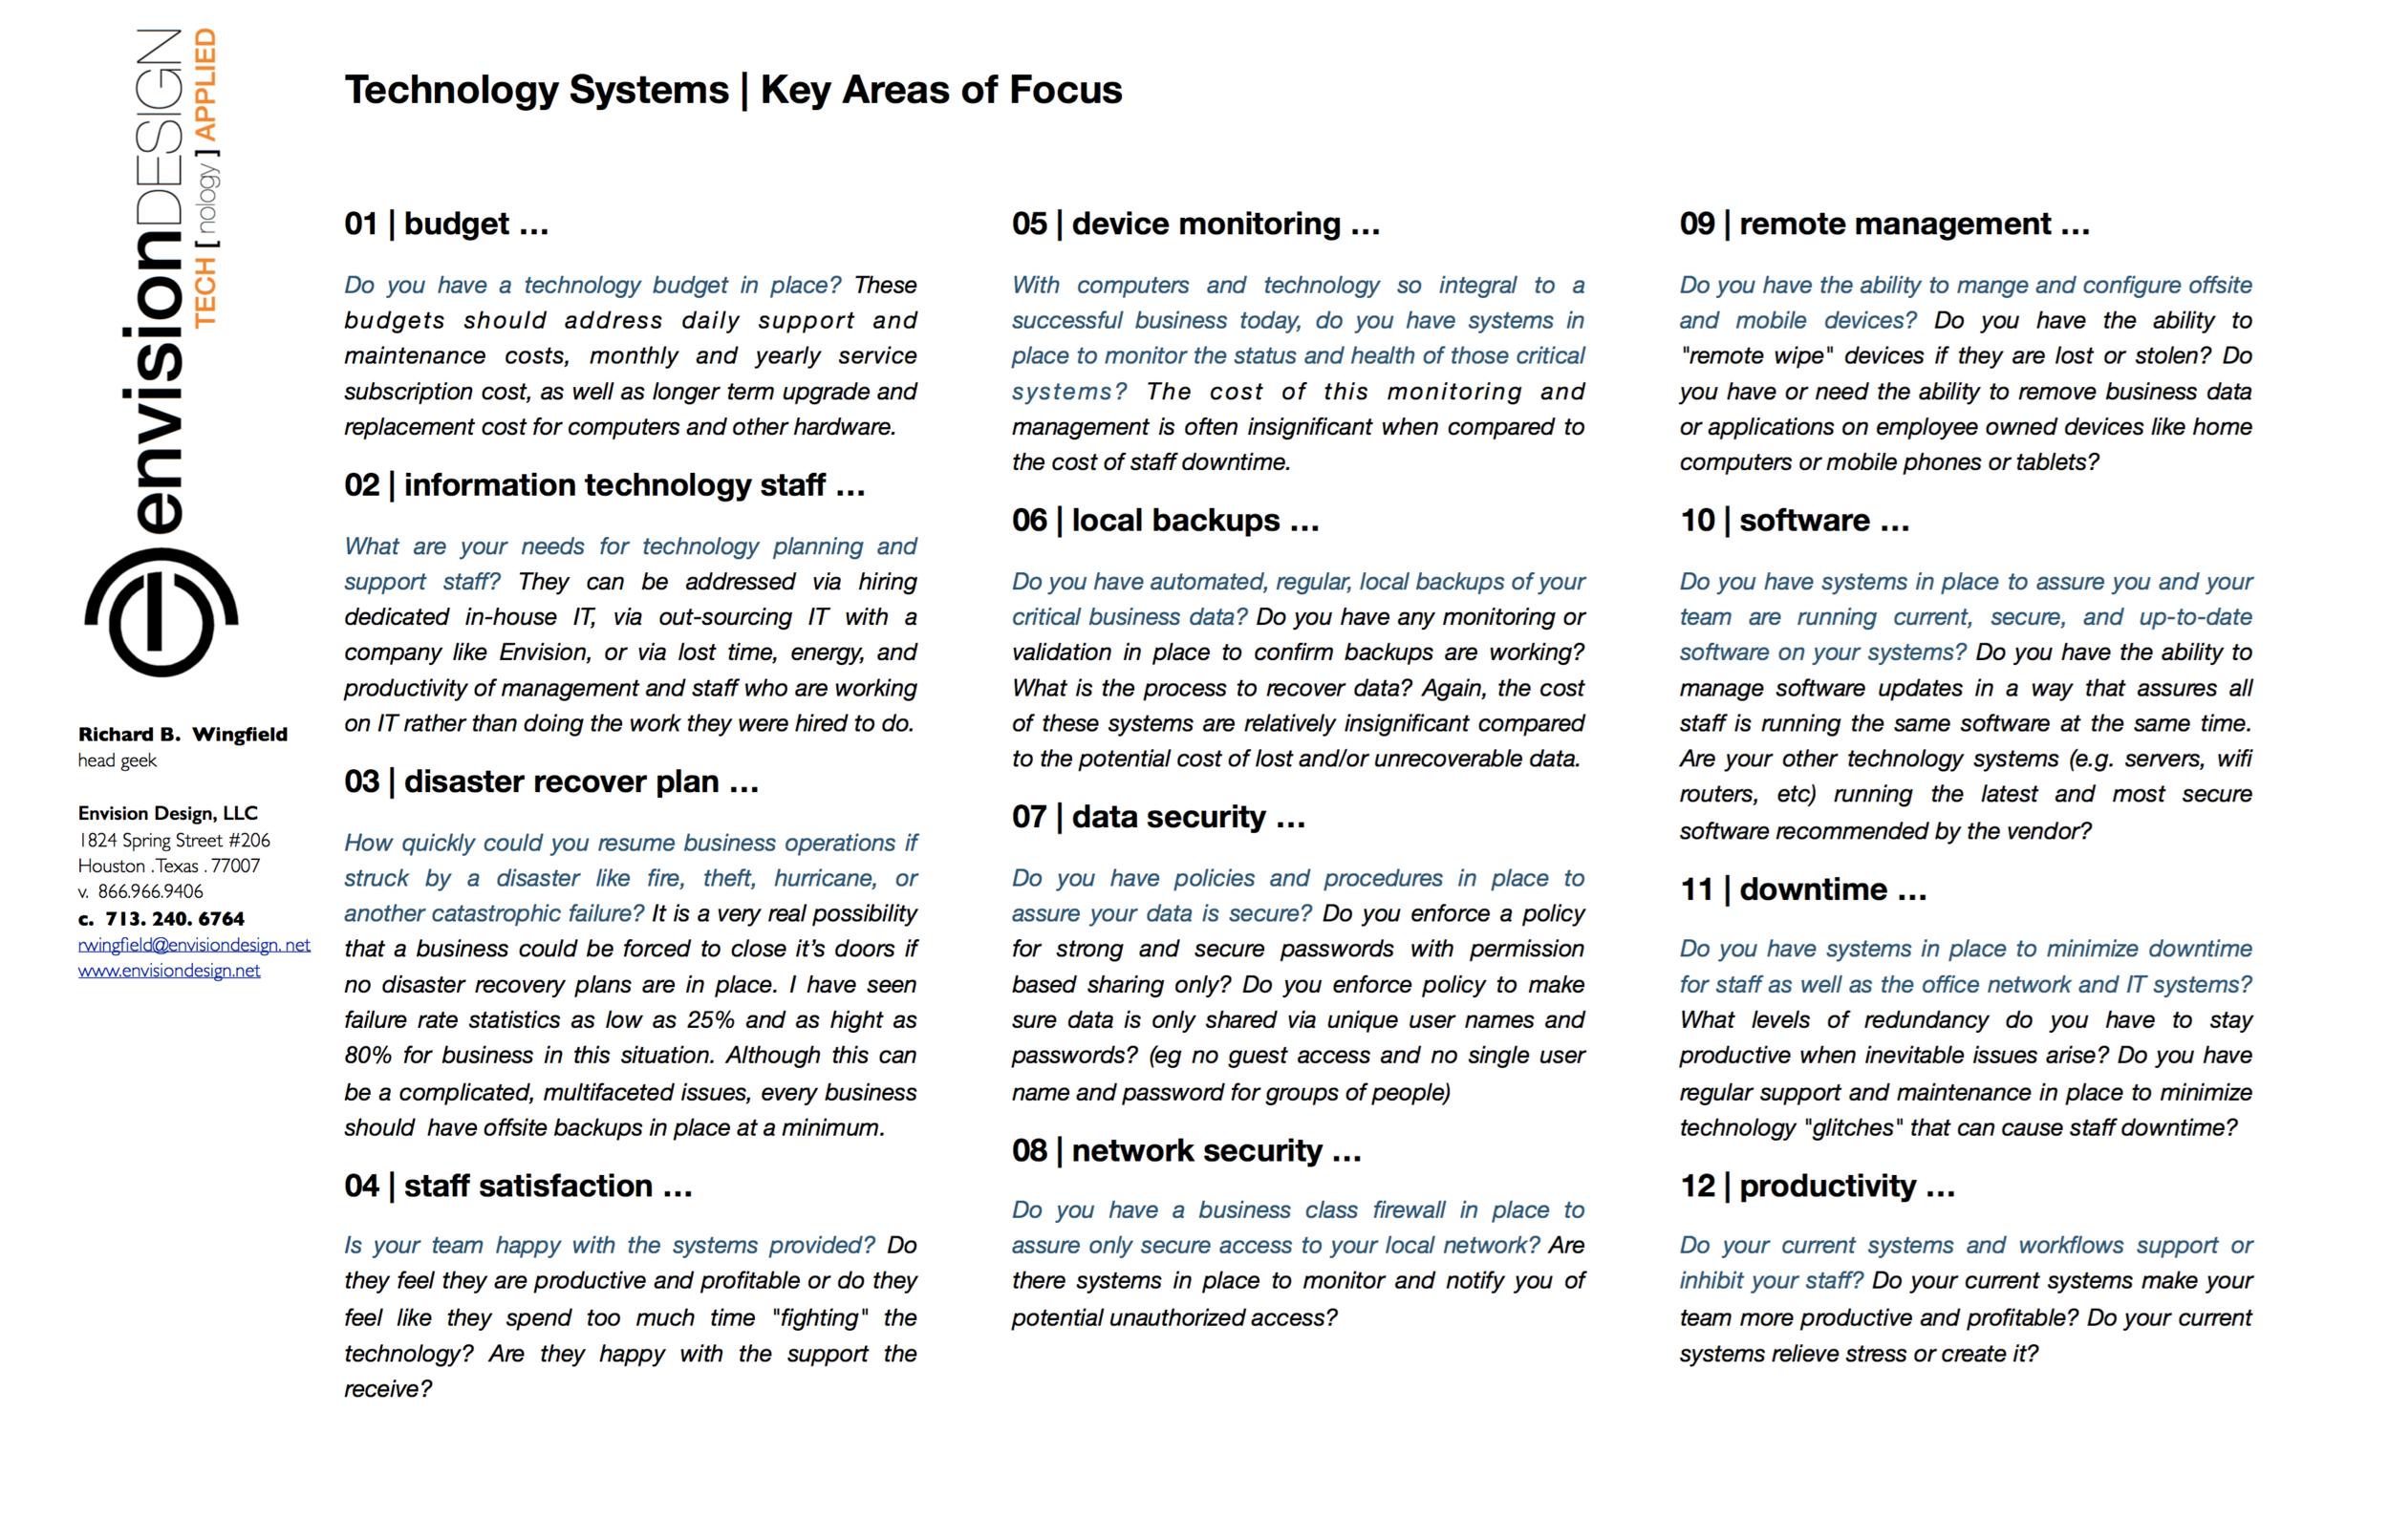 IT key areas of focus